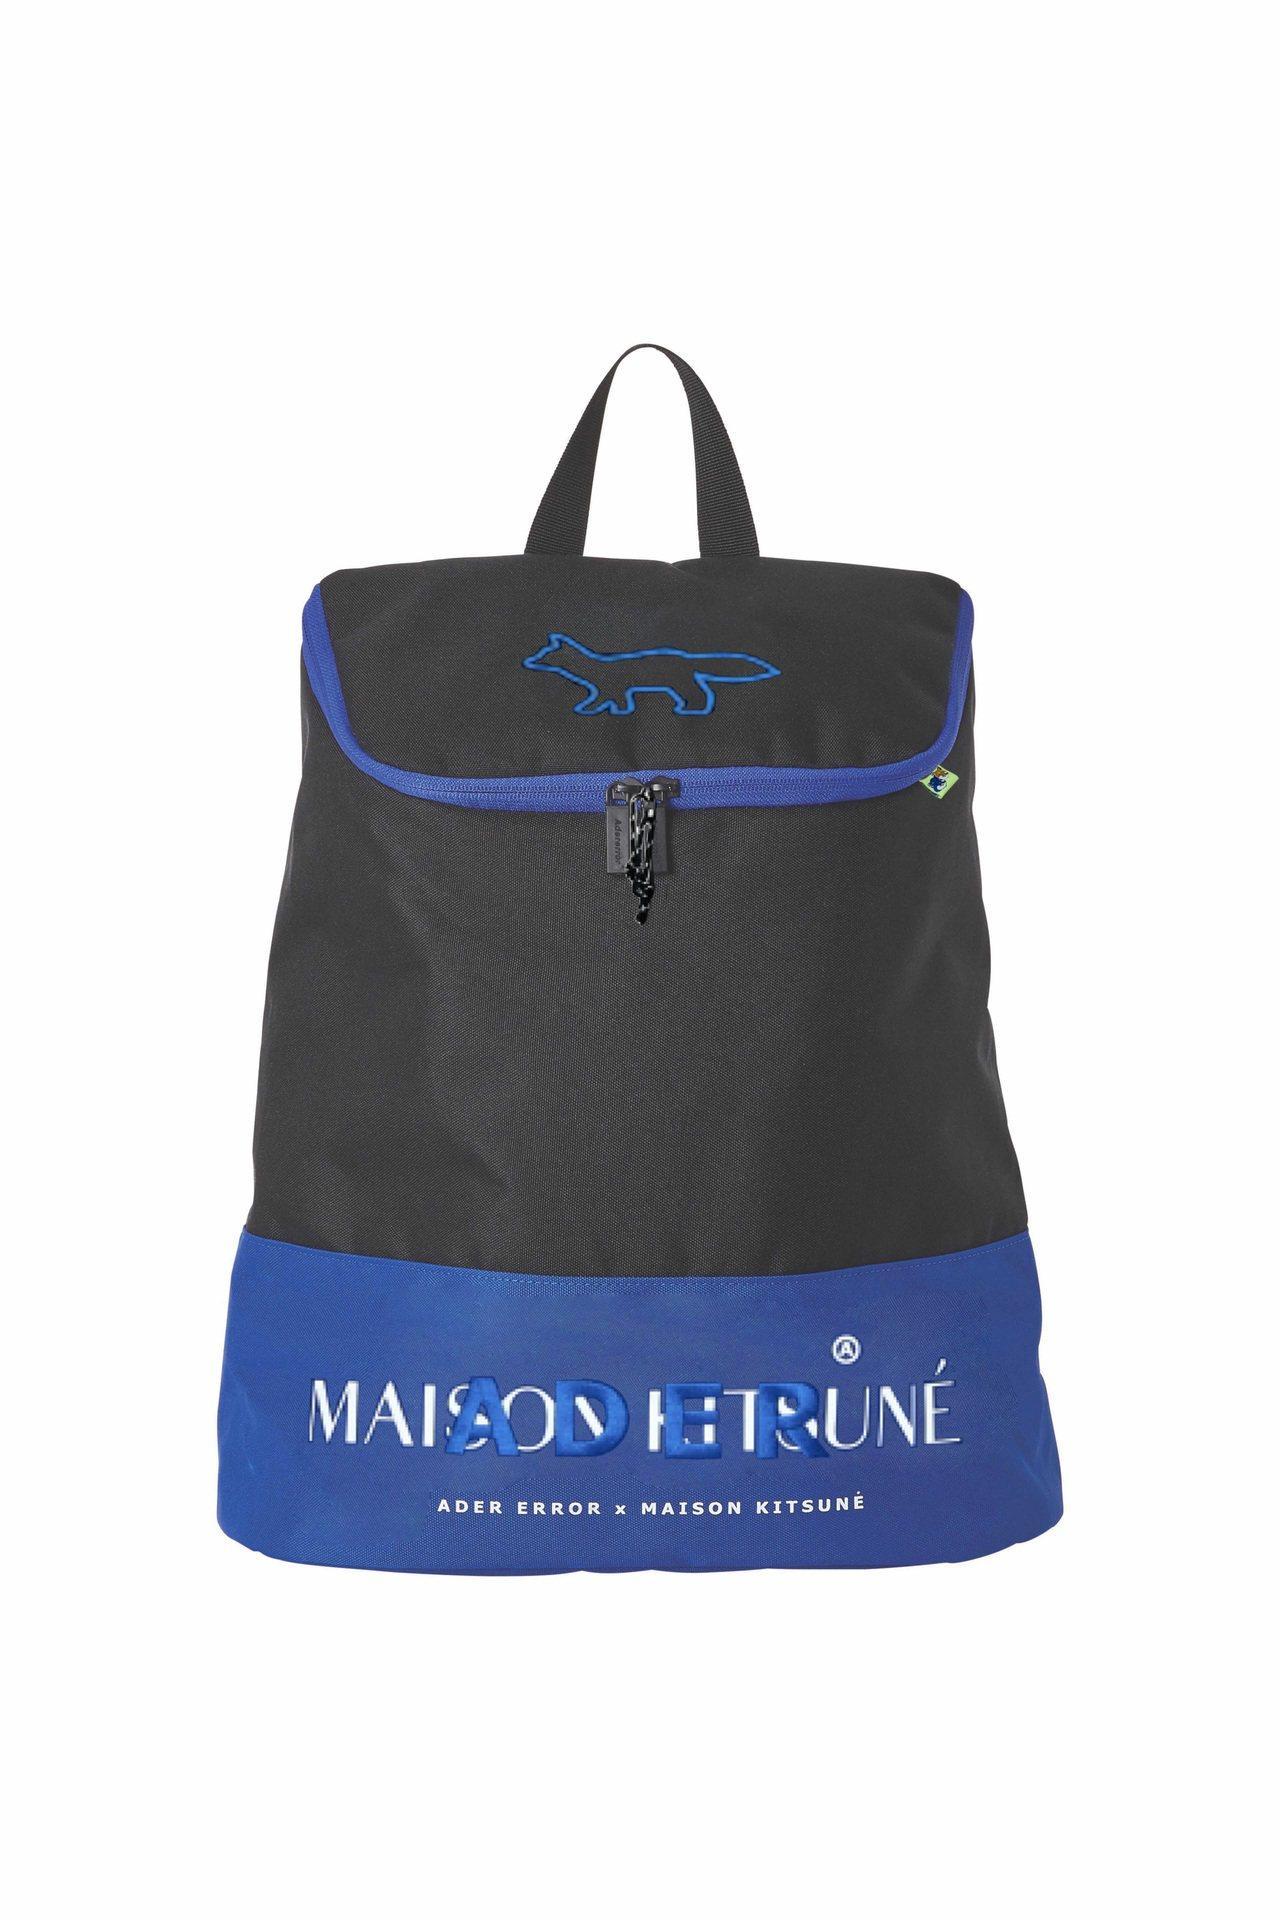 ADER x MAISON KITSUNÉ拉鍊後背包,售價9,980元。圖/AR...